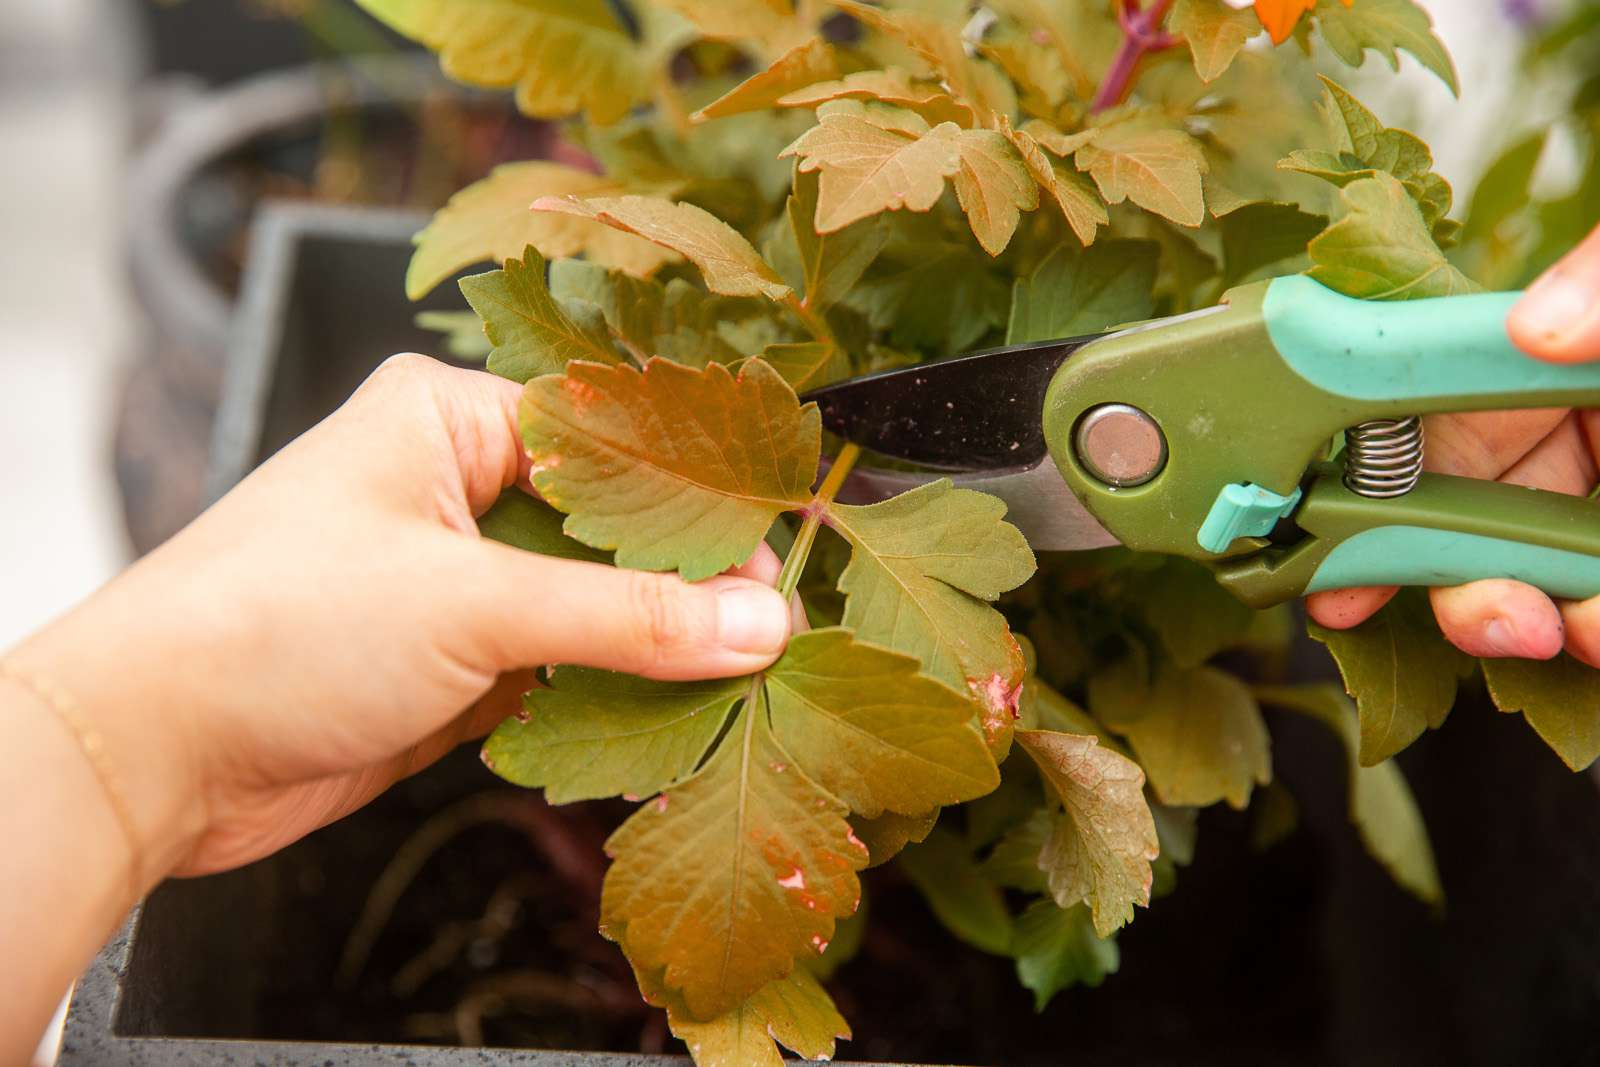 Dahlia plant foliage cut back with green hand-held pruners closeup